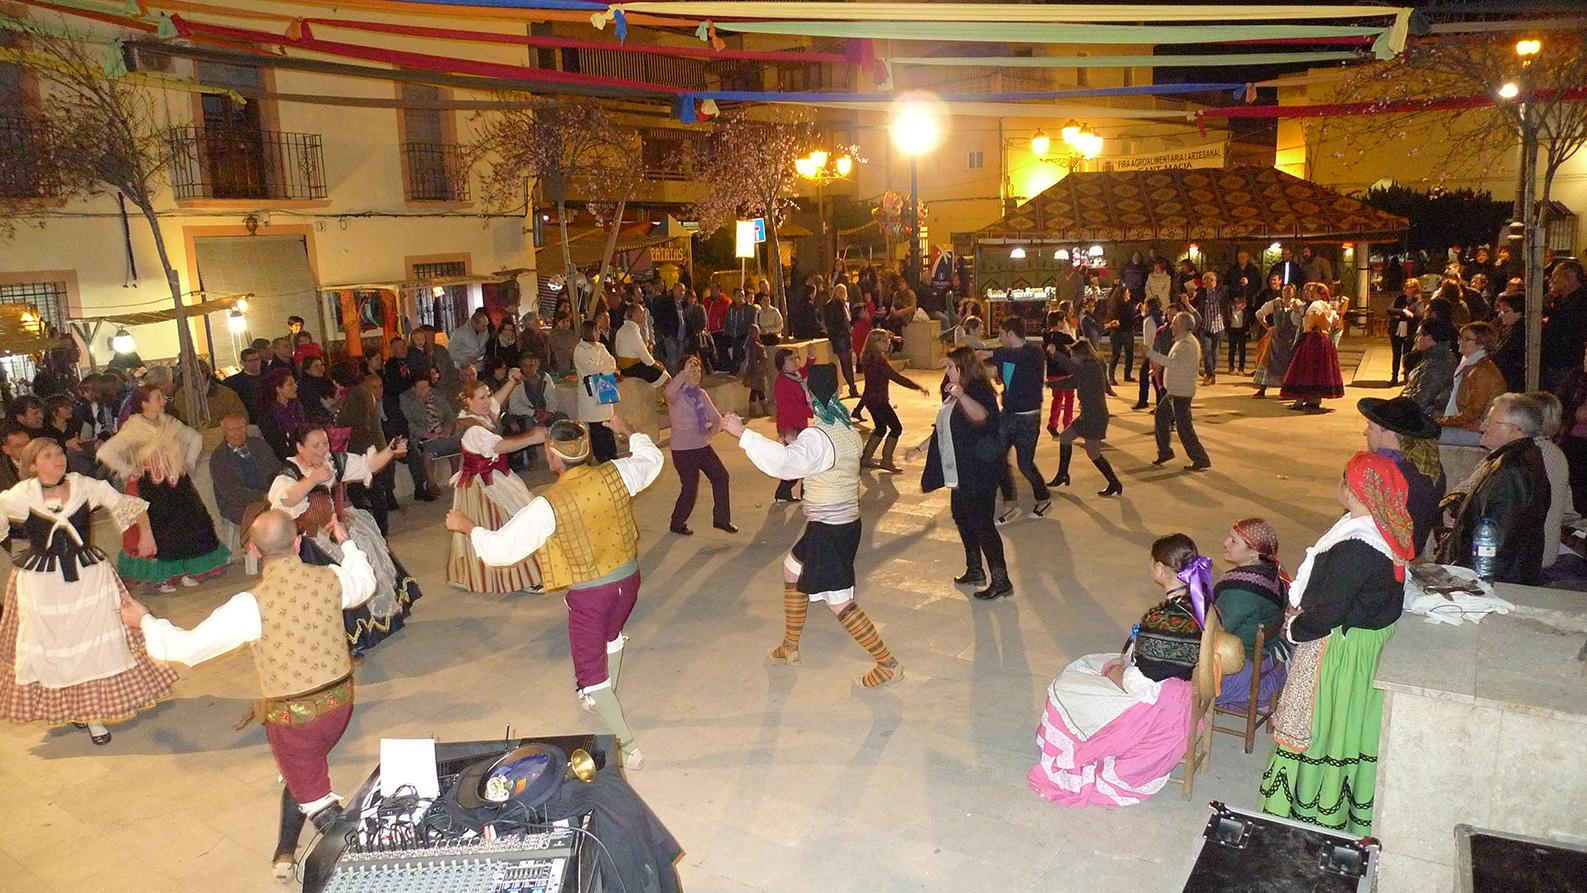 2014-02-23 - Baladre a Fira St. Marcia-ROTOVA (226)